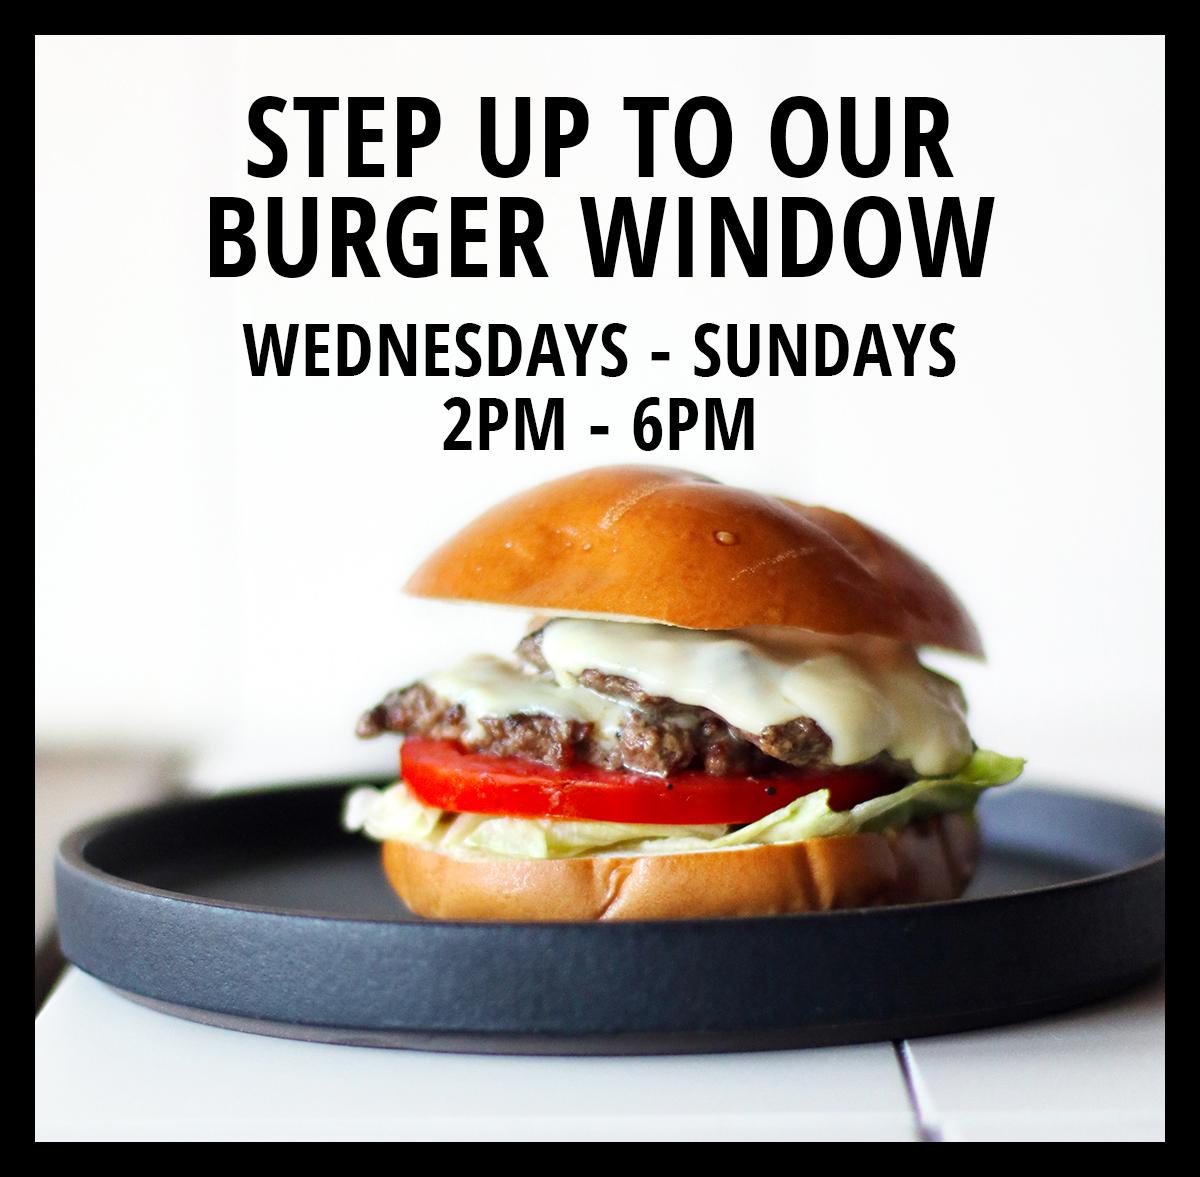 Burger Window - Wednesdays to Sundays 2pm to 6pm